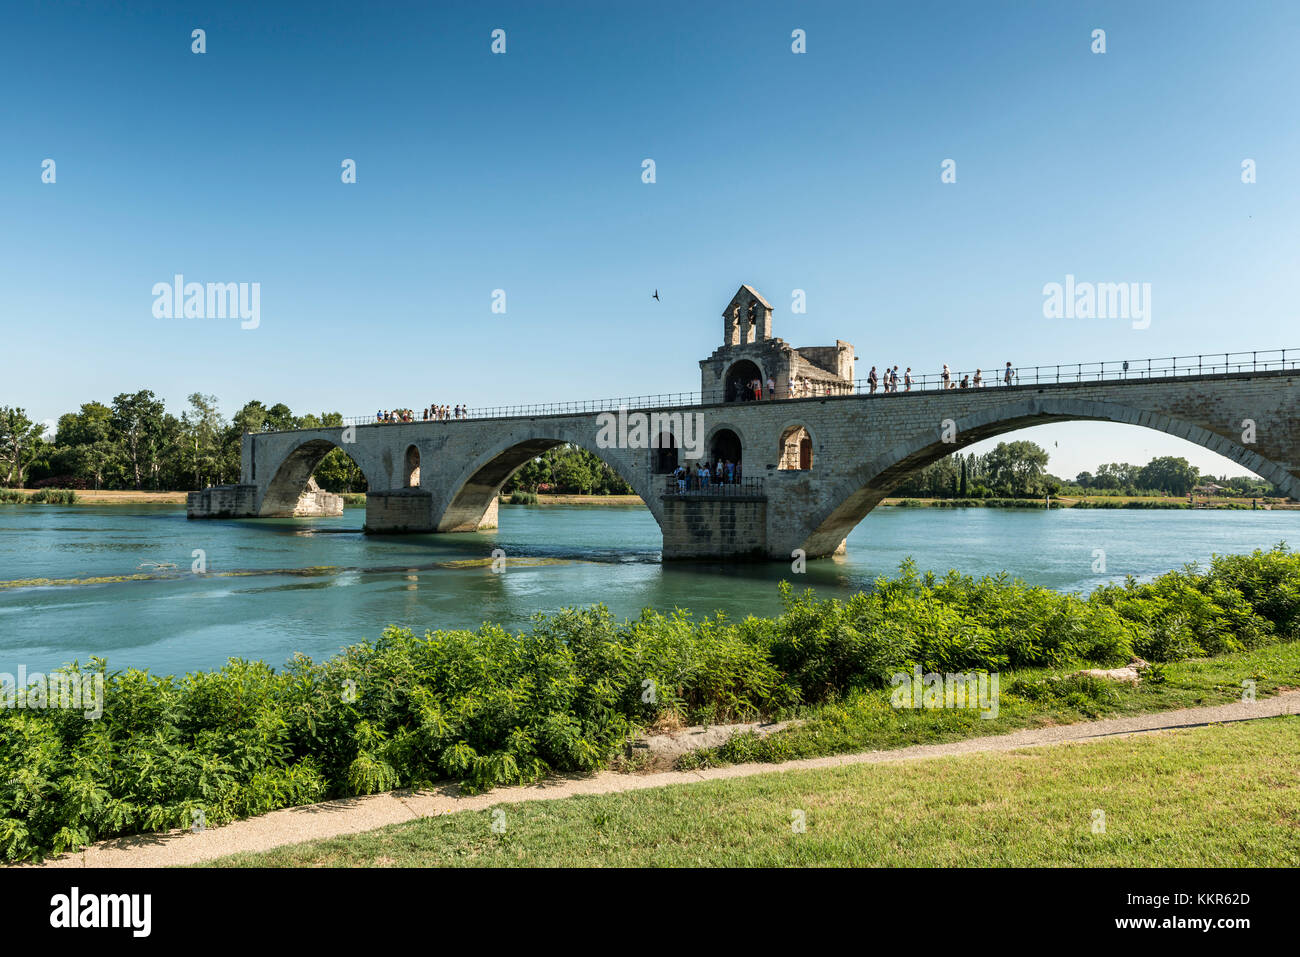 Avignon, Provence, Provence-Alpes-Côte d'Azur, Vaucluse, Southern France, France, Bridge of St Benezet - Stock Image